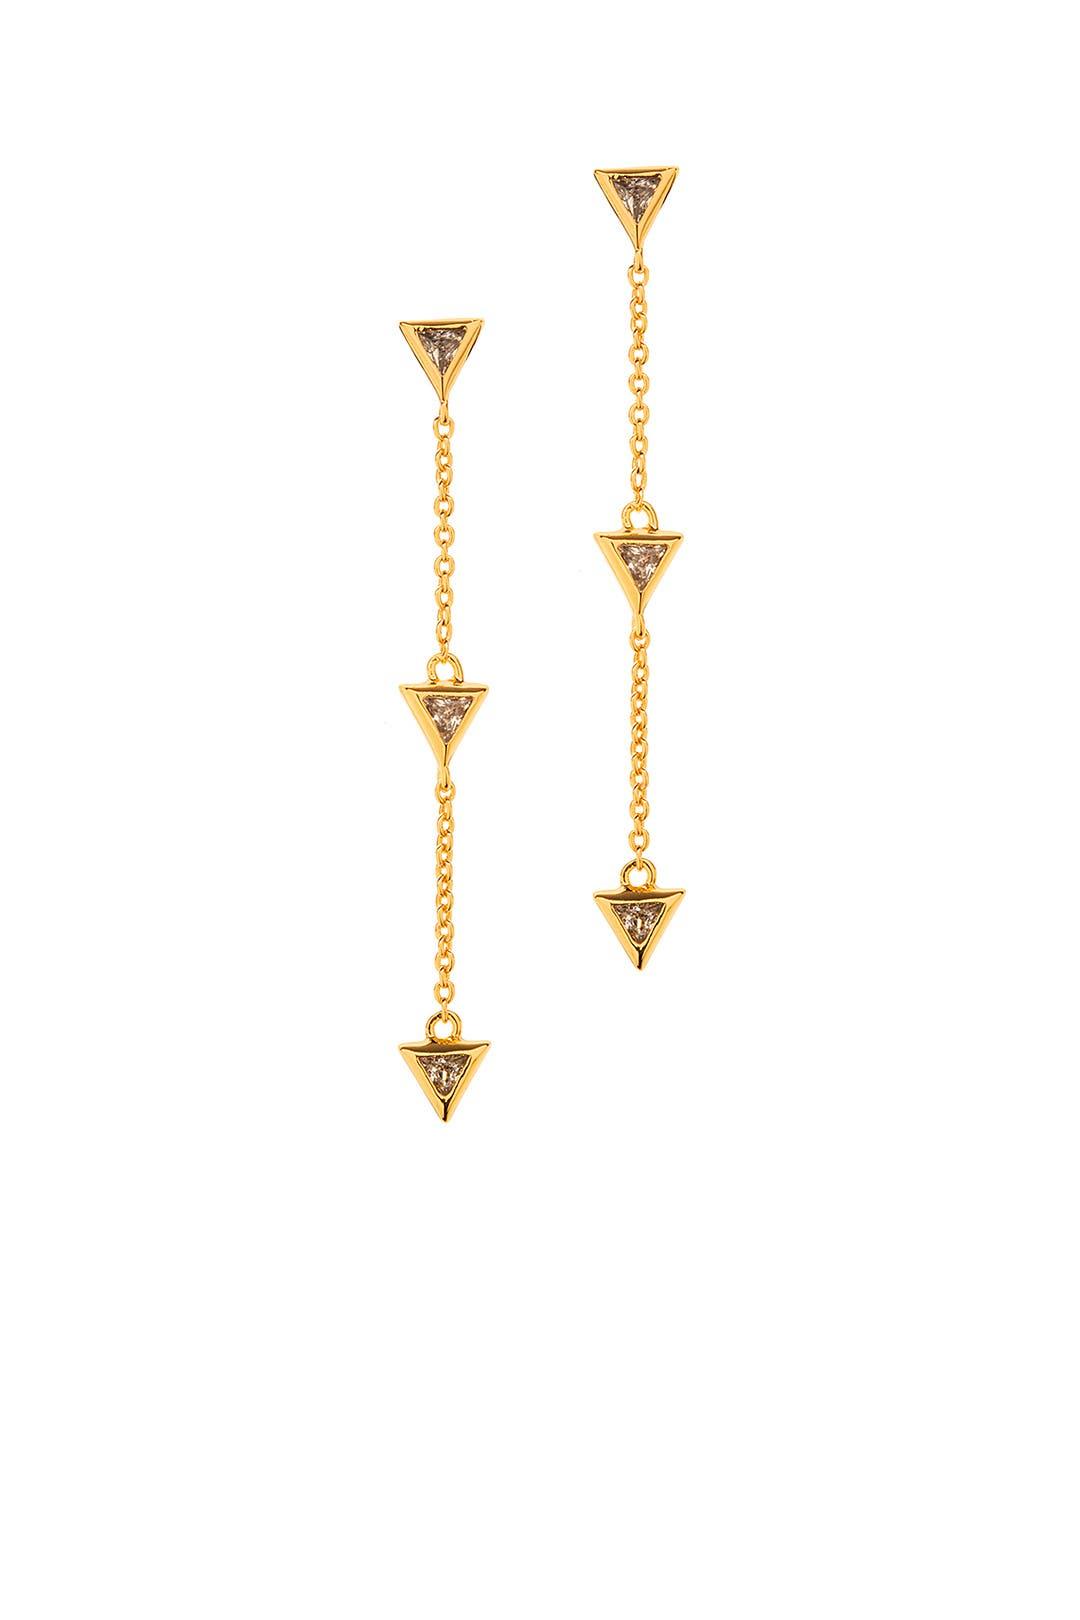 Vivienne Drop Earrings By Gorjana Accessories For $10  Rent The Runway